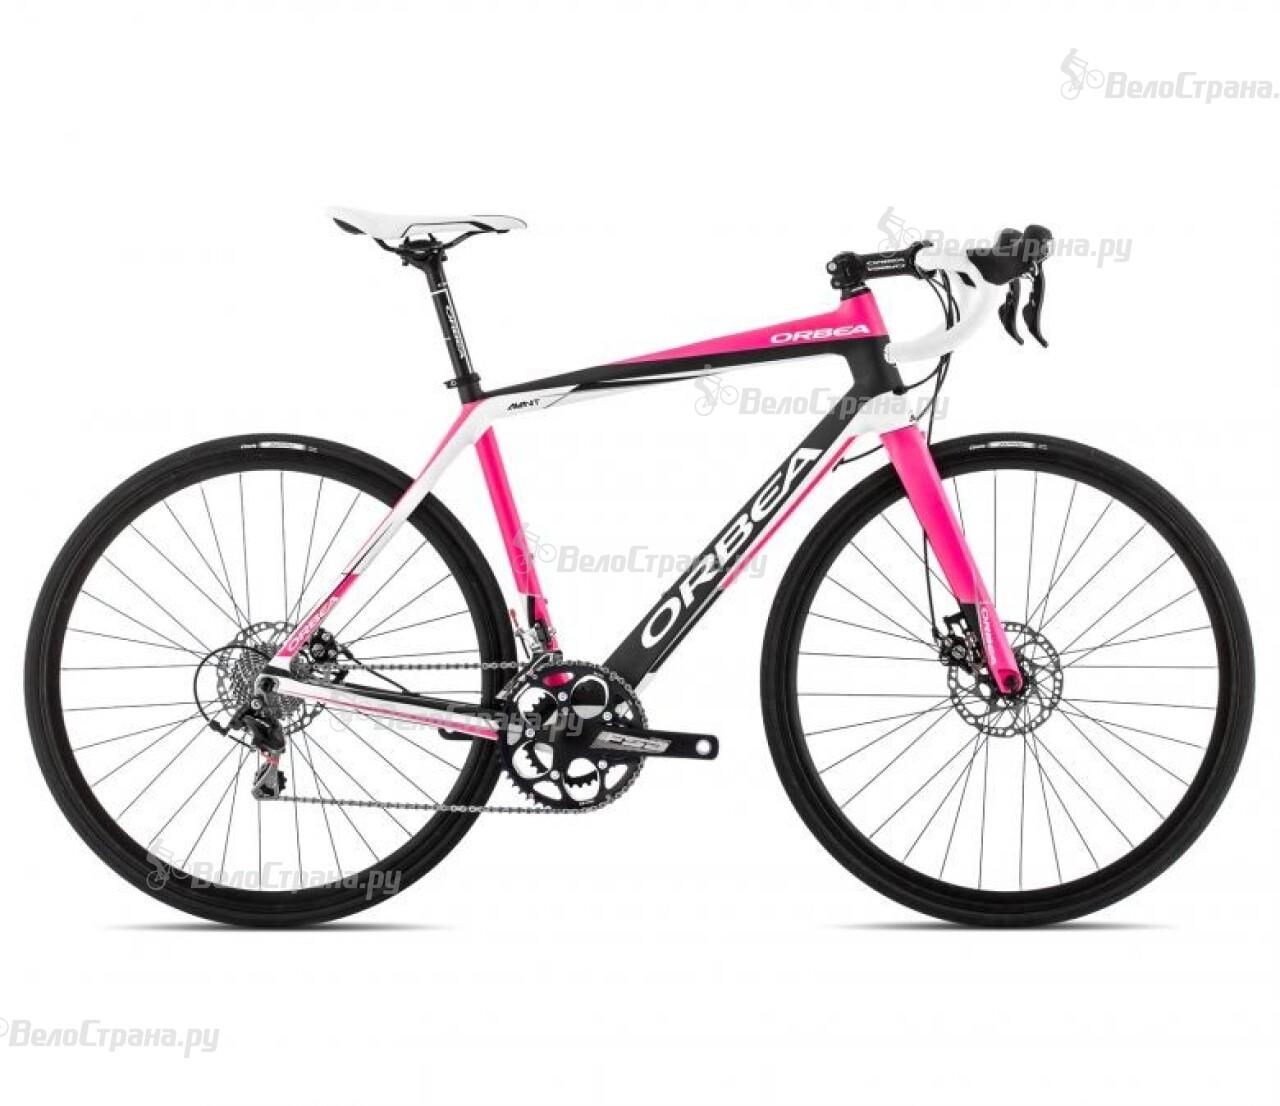 Велосипед Orbea Avant M50d (2014) велосипед wheeler protron 50 2014